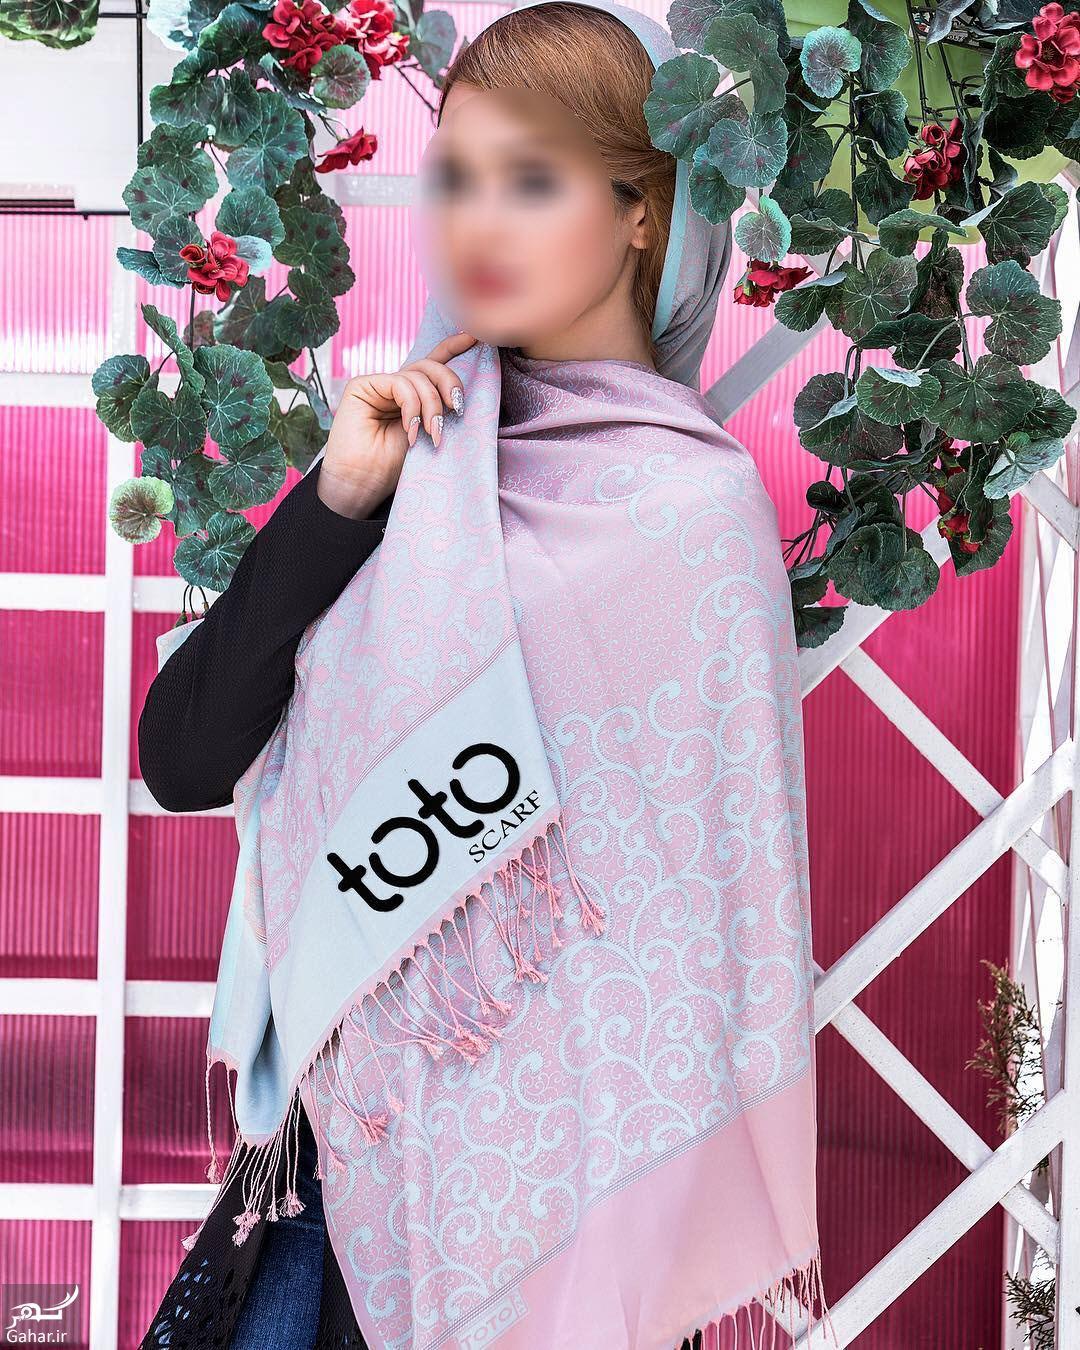 402372 Gahar ir جدیدترین مدل های شال و روسری از برند ایرانی توتو